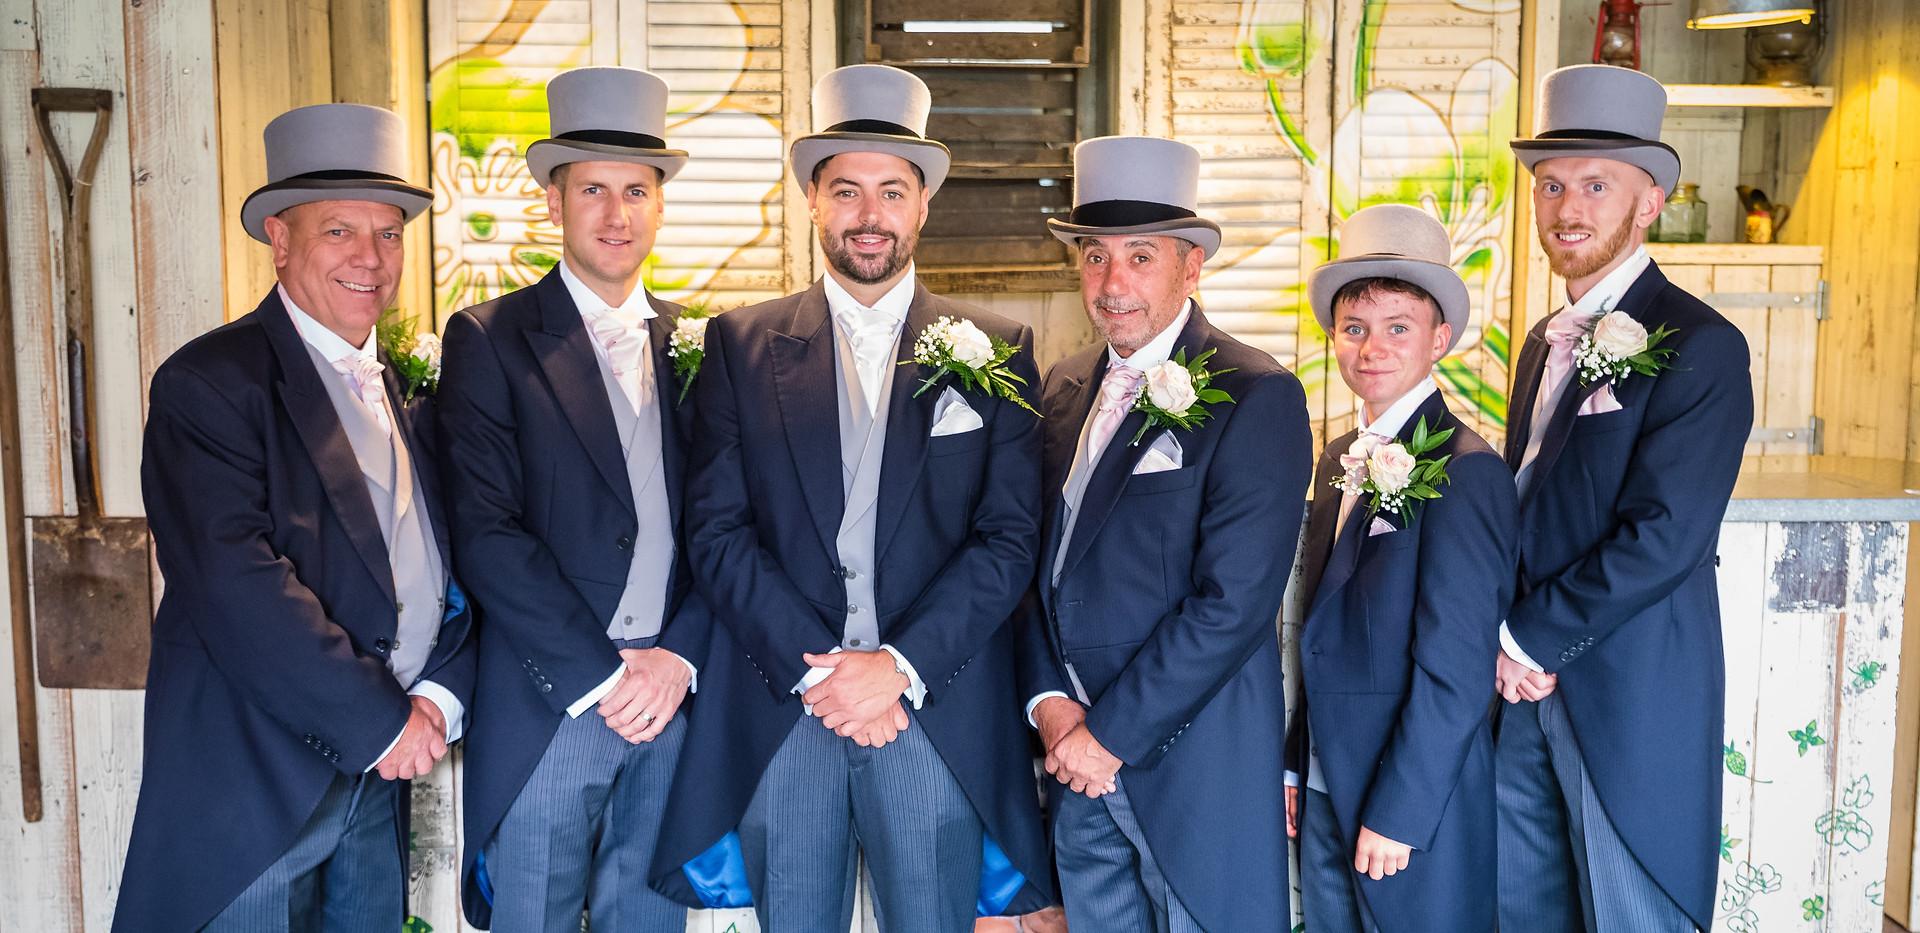 Oddfellows Wedding Photography___5.jpg